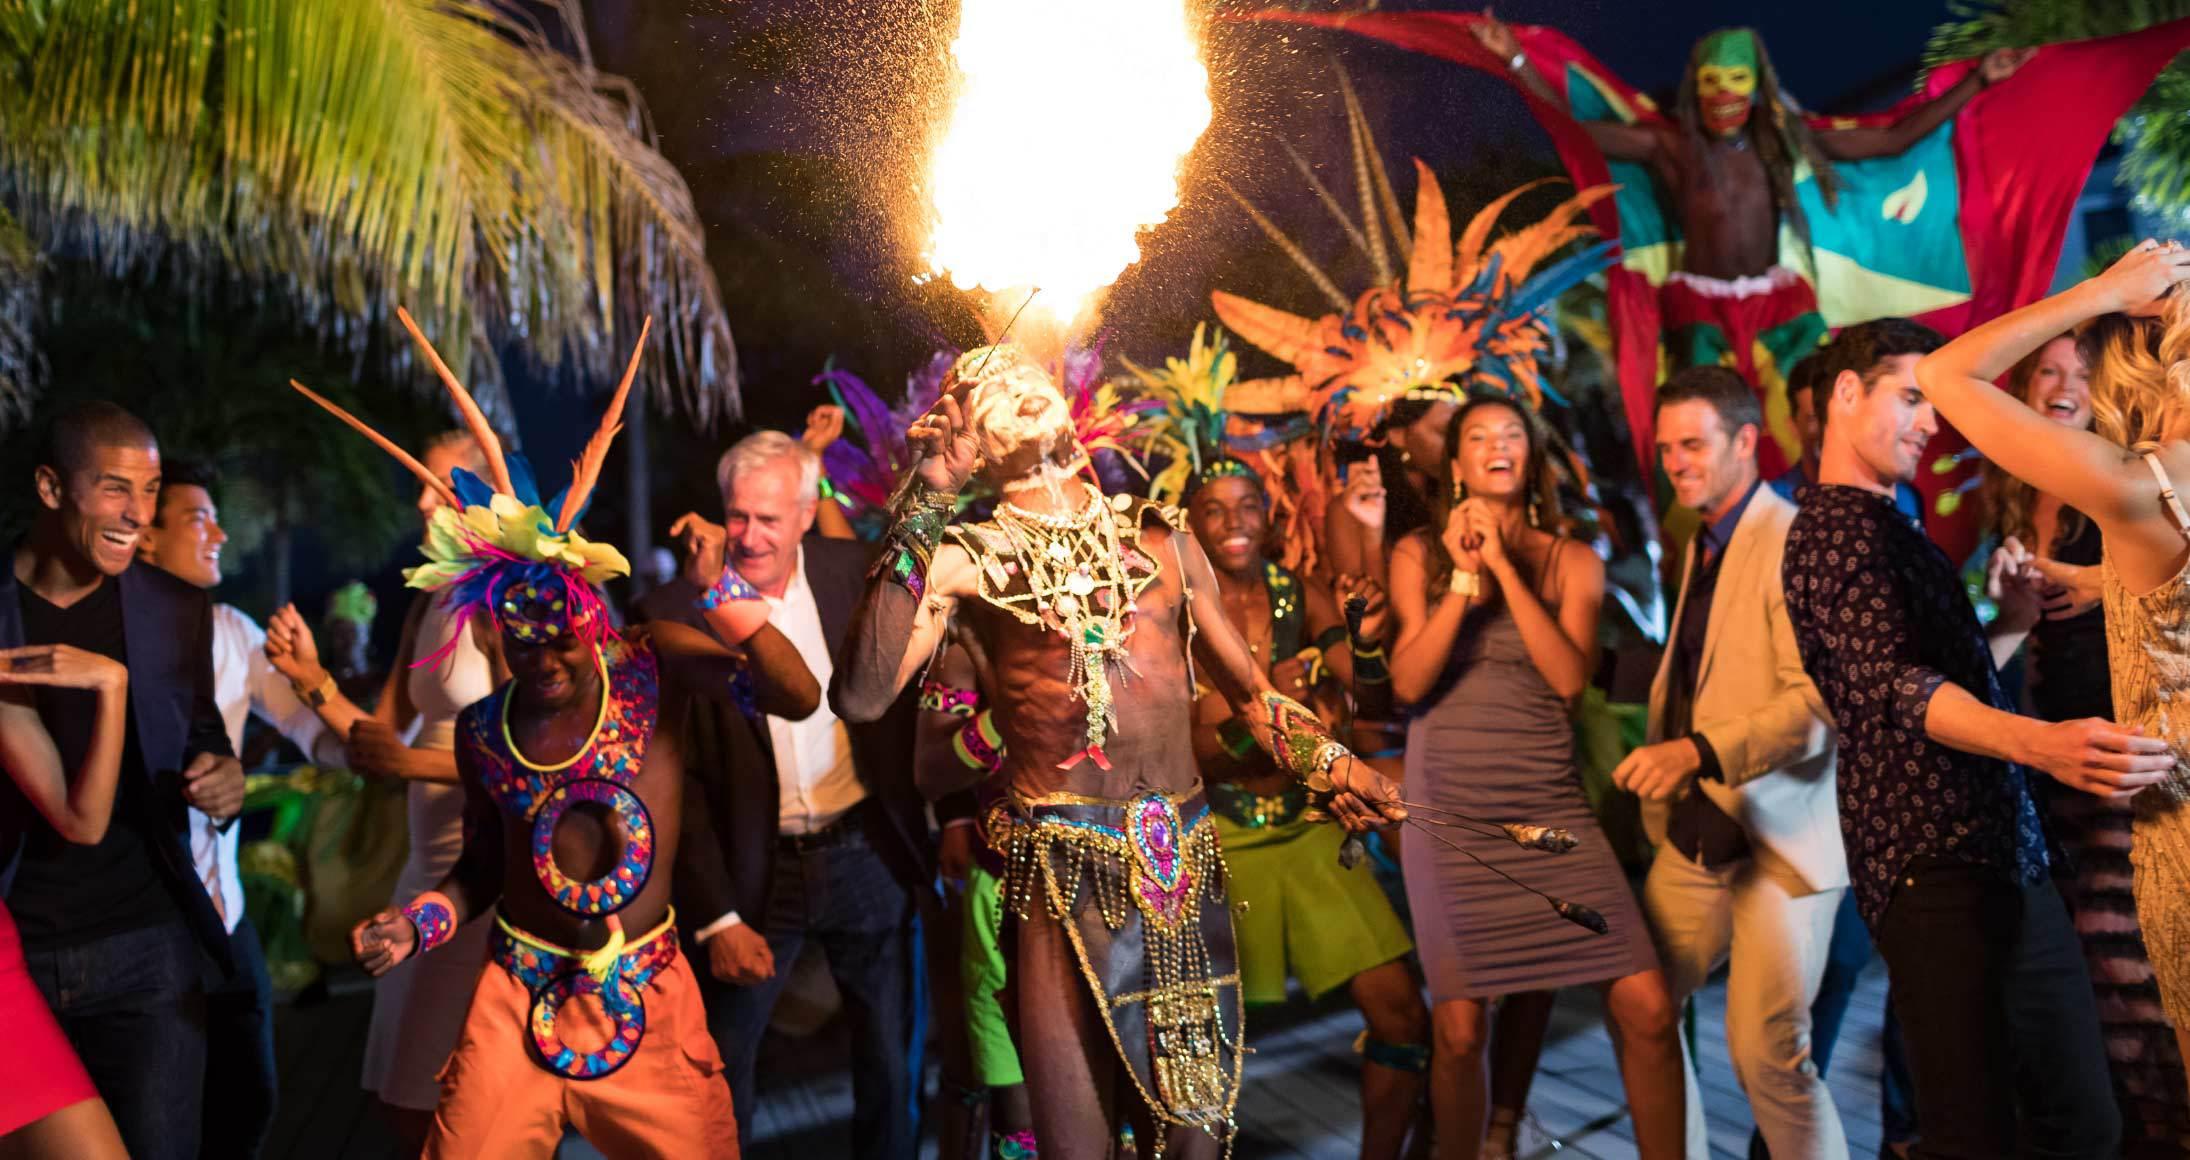 Sandals Grenada - All-Inclusive Resort on Pink Gin Beach, St